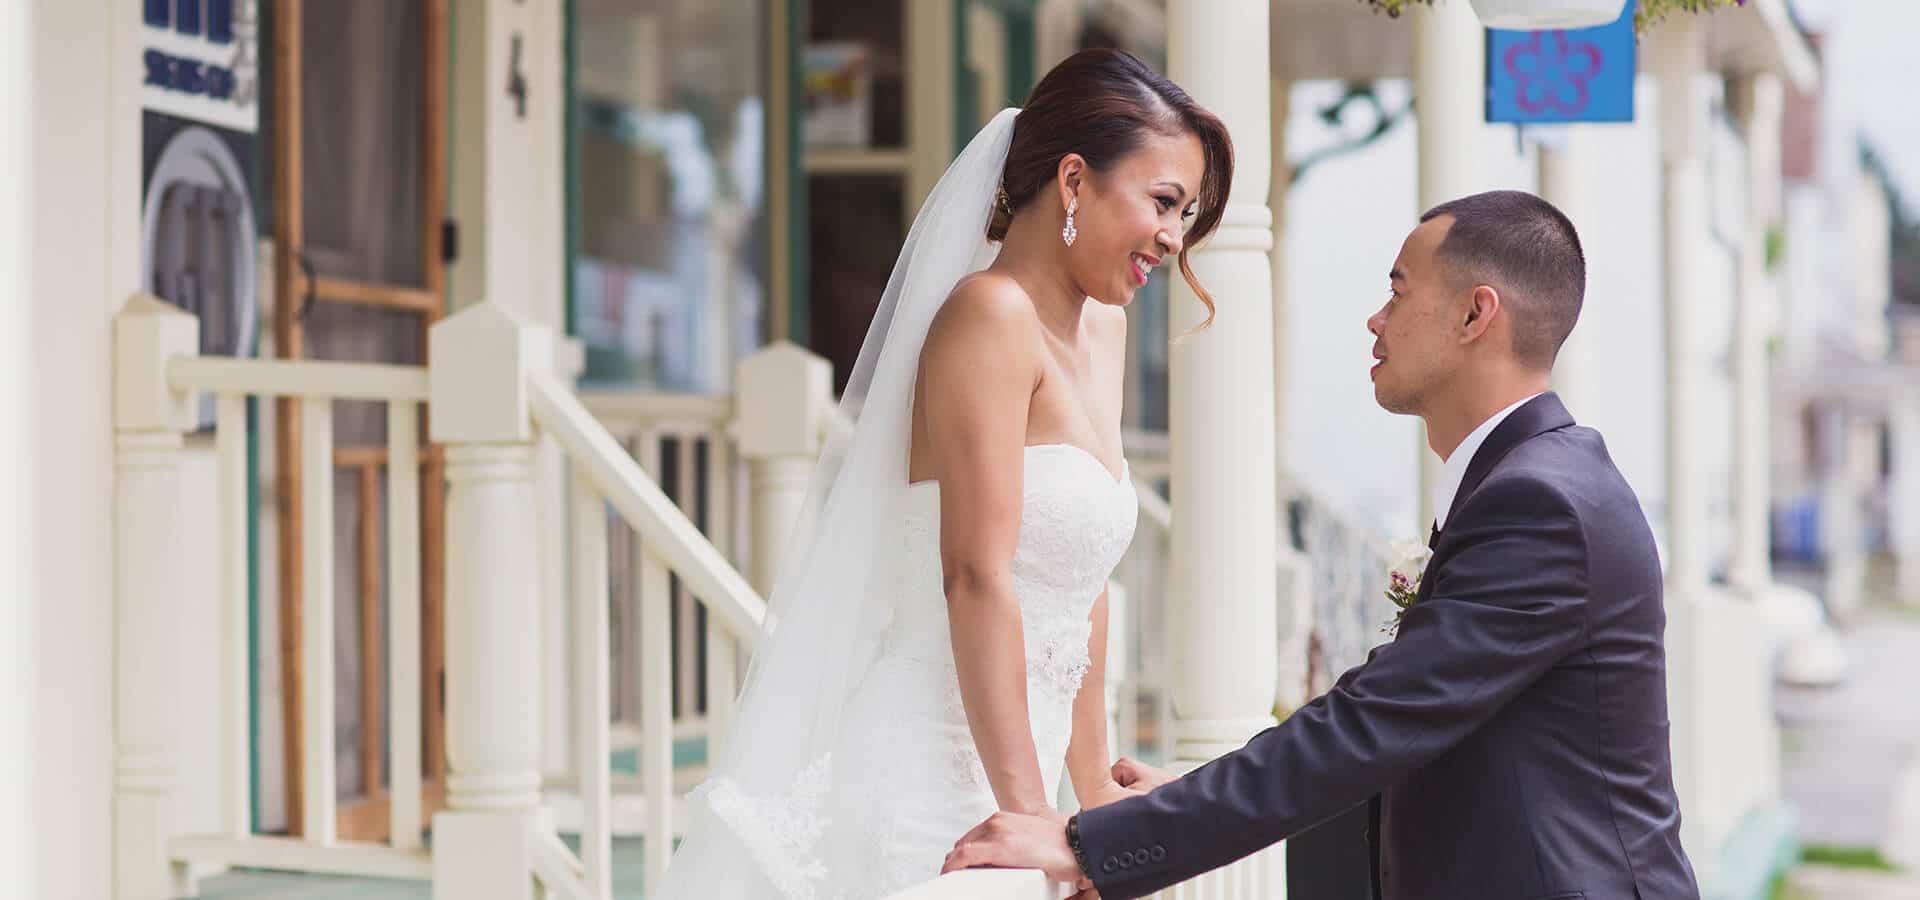 Hero image for Megan & Carlo's Fresh Summer Wedding at The Manor